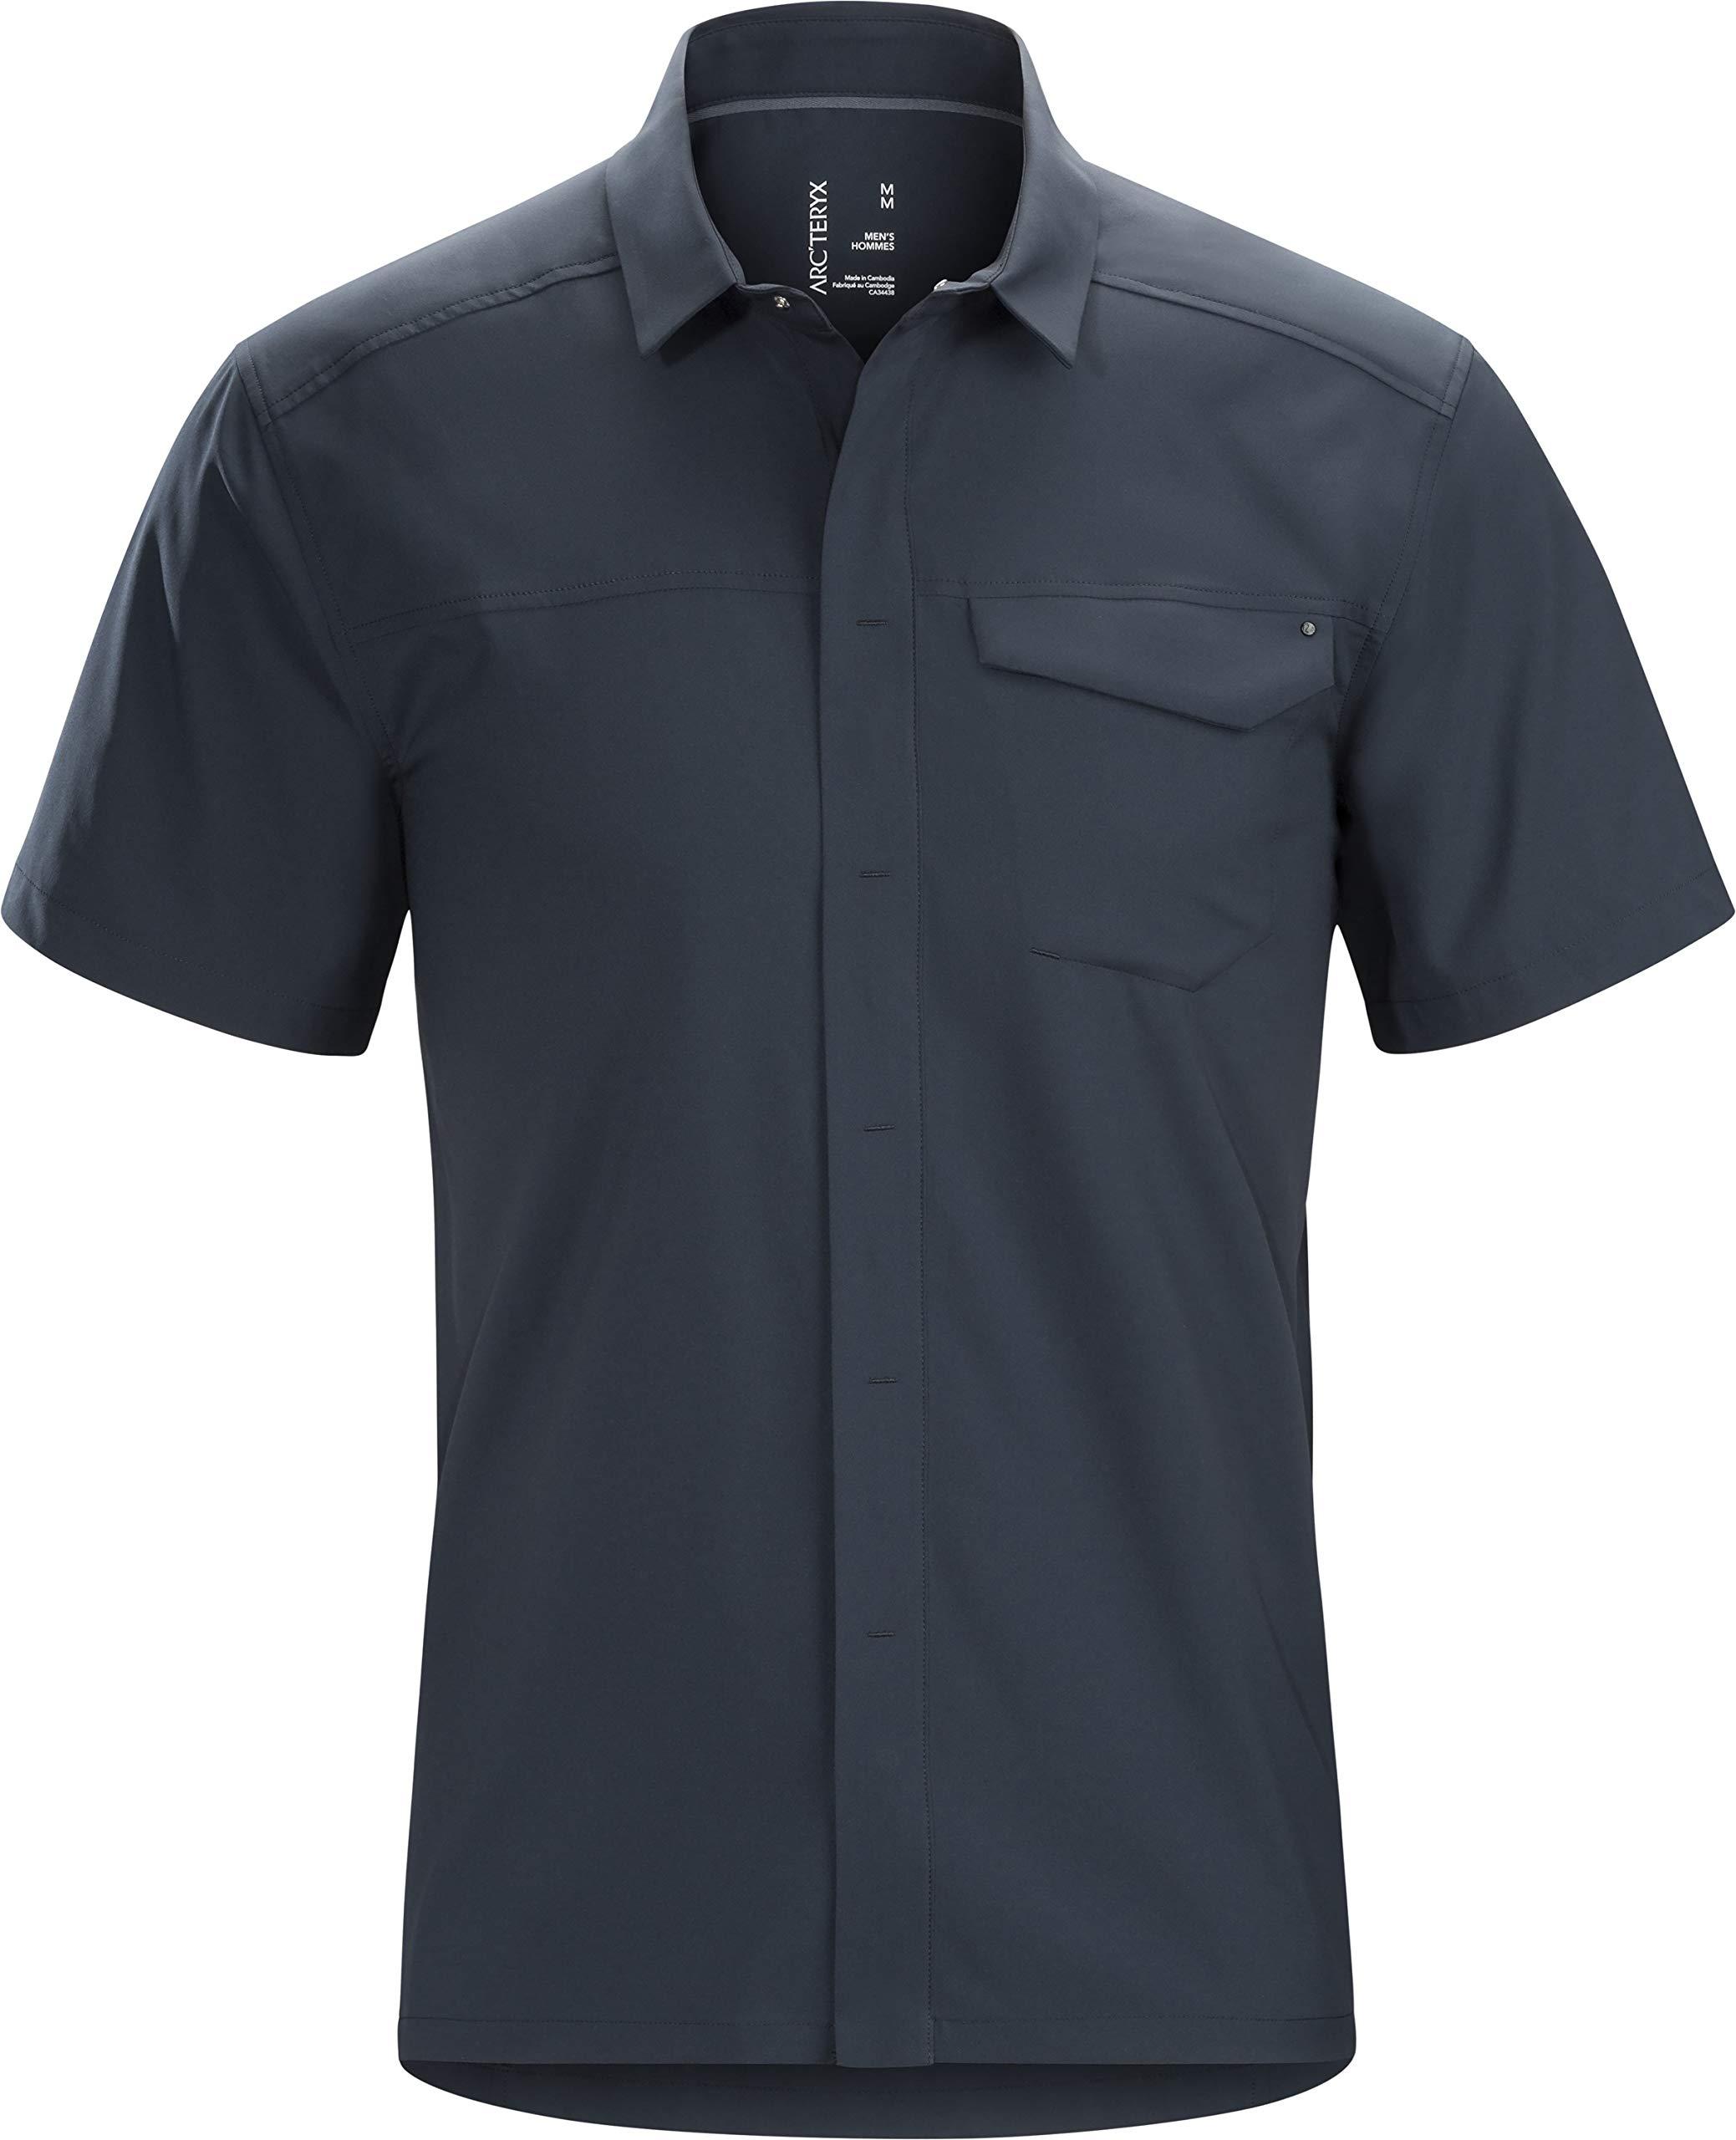 Arc'teryx Skyline SS Shirt Men's (Tui, Small)